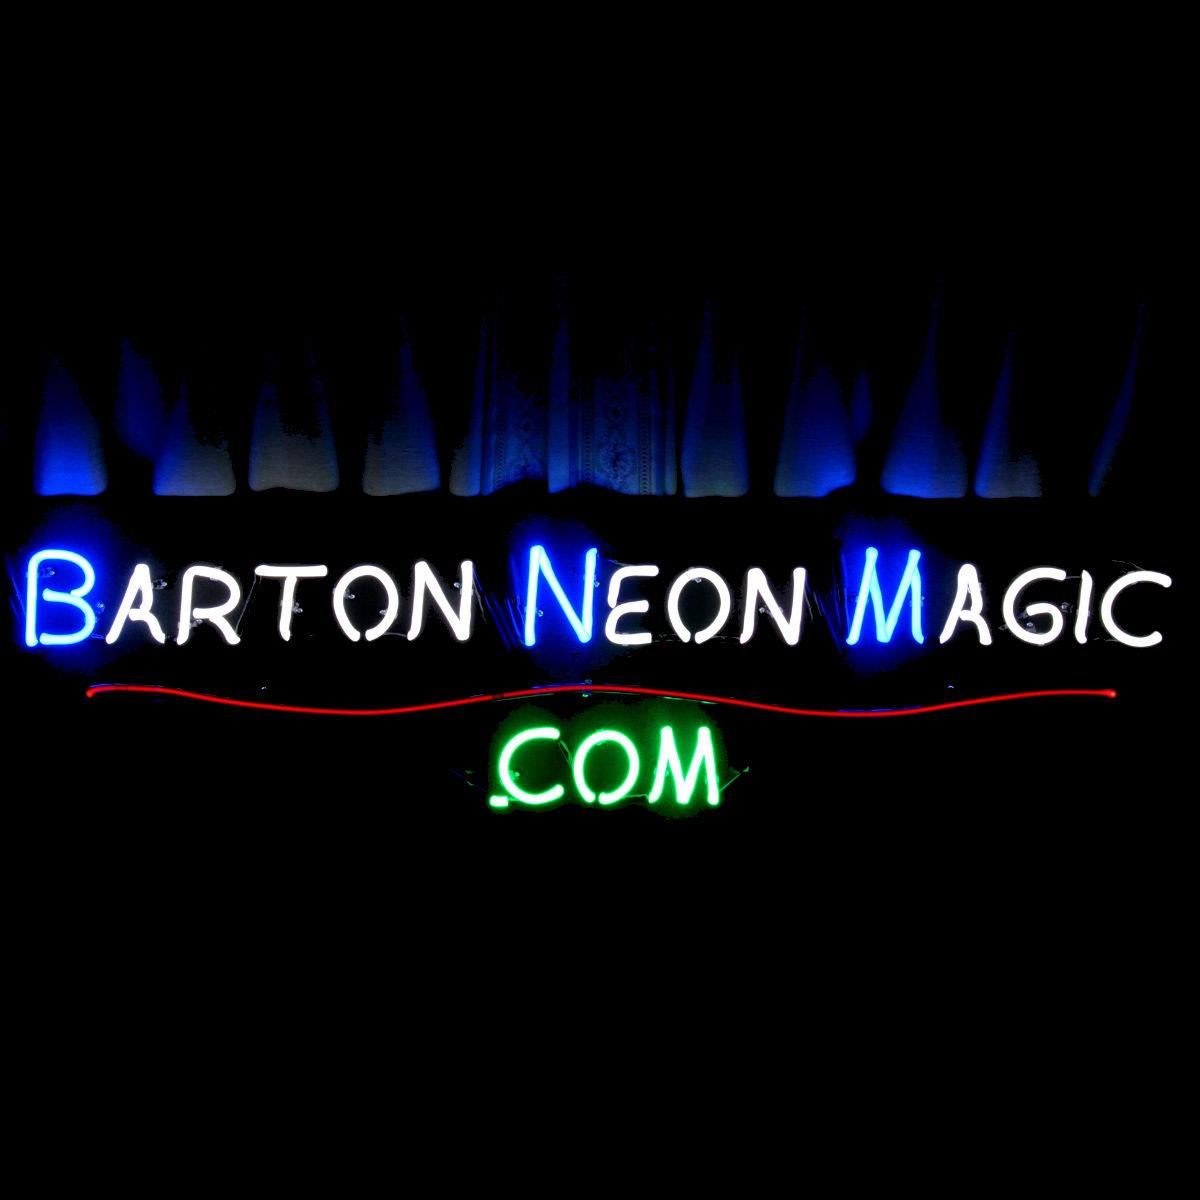 Designer Hand-blown Neon Light Artworks by John Barton - Famous USA Neon Glass Artist - BartonNeonMagic.com